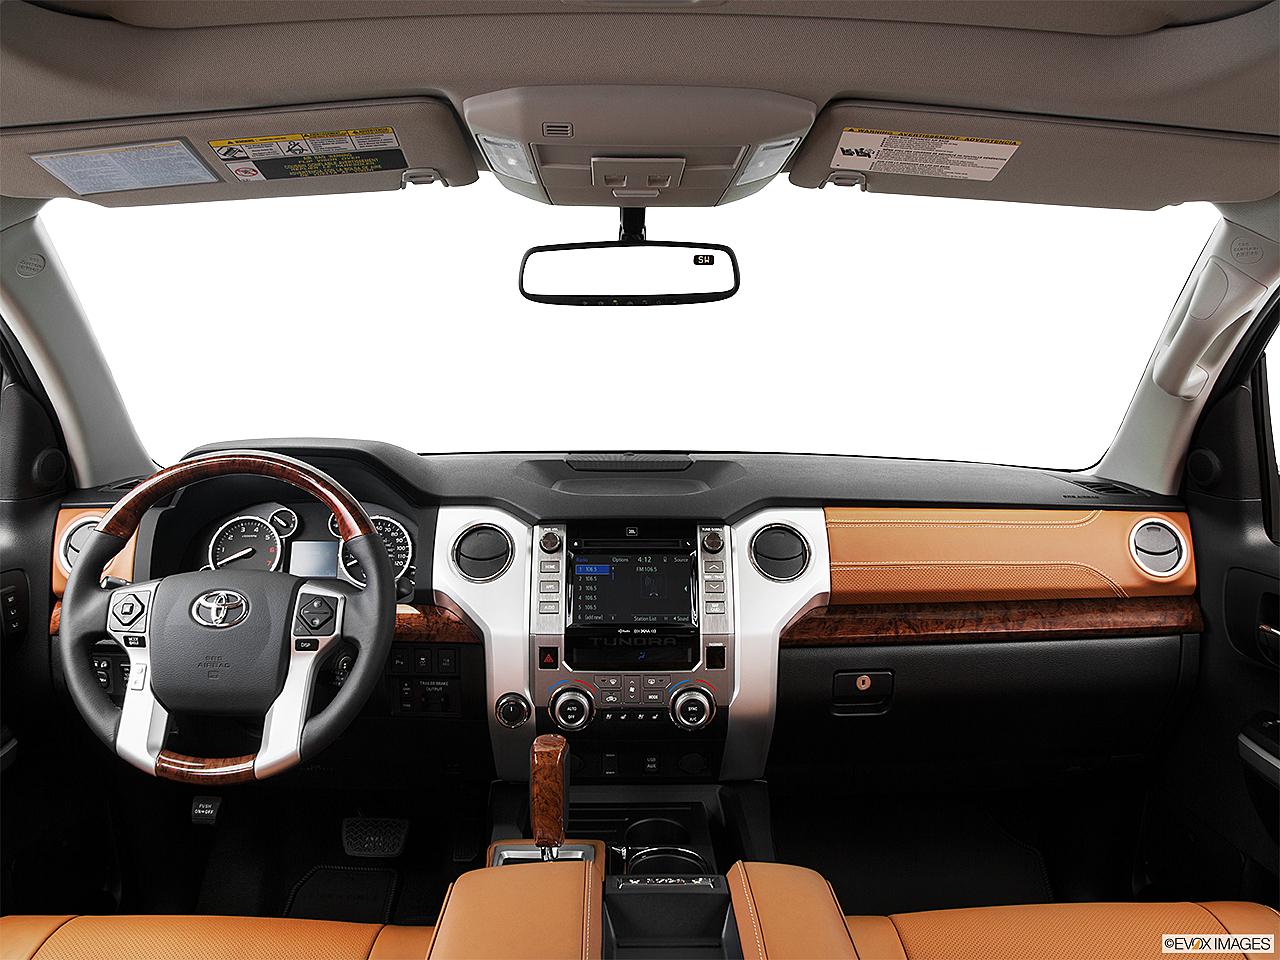 2017 Toyota Tundra 4x2 1794 Edition 4dr Crewmax Cab Pickup Sb 5 7l V8 Ffv Research Groovecar